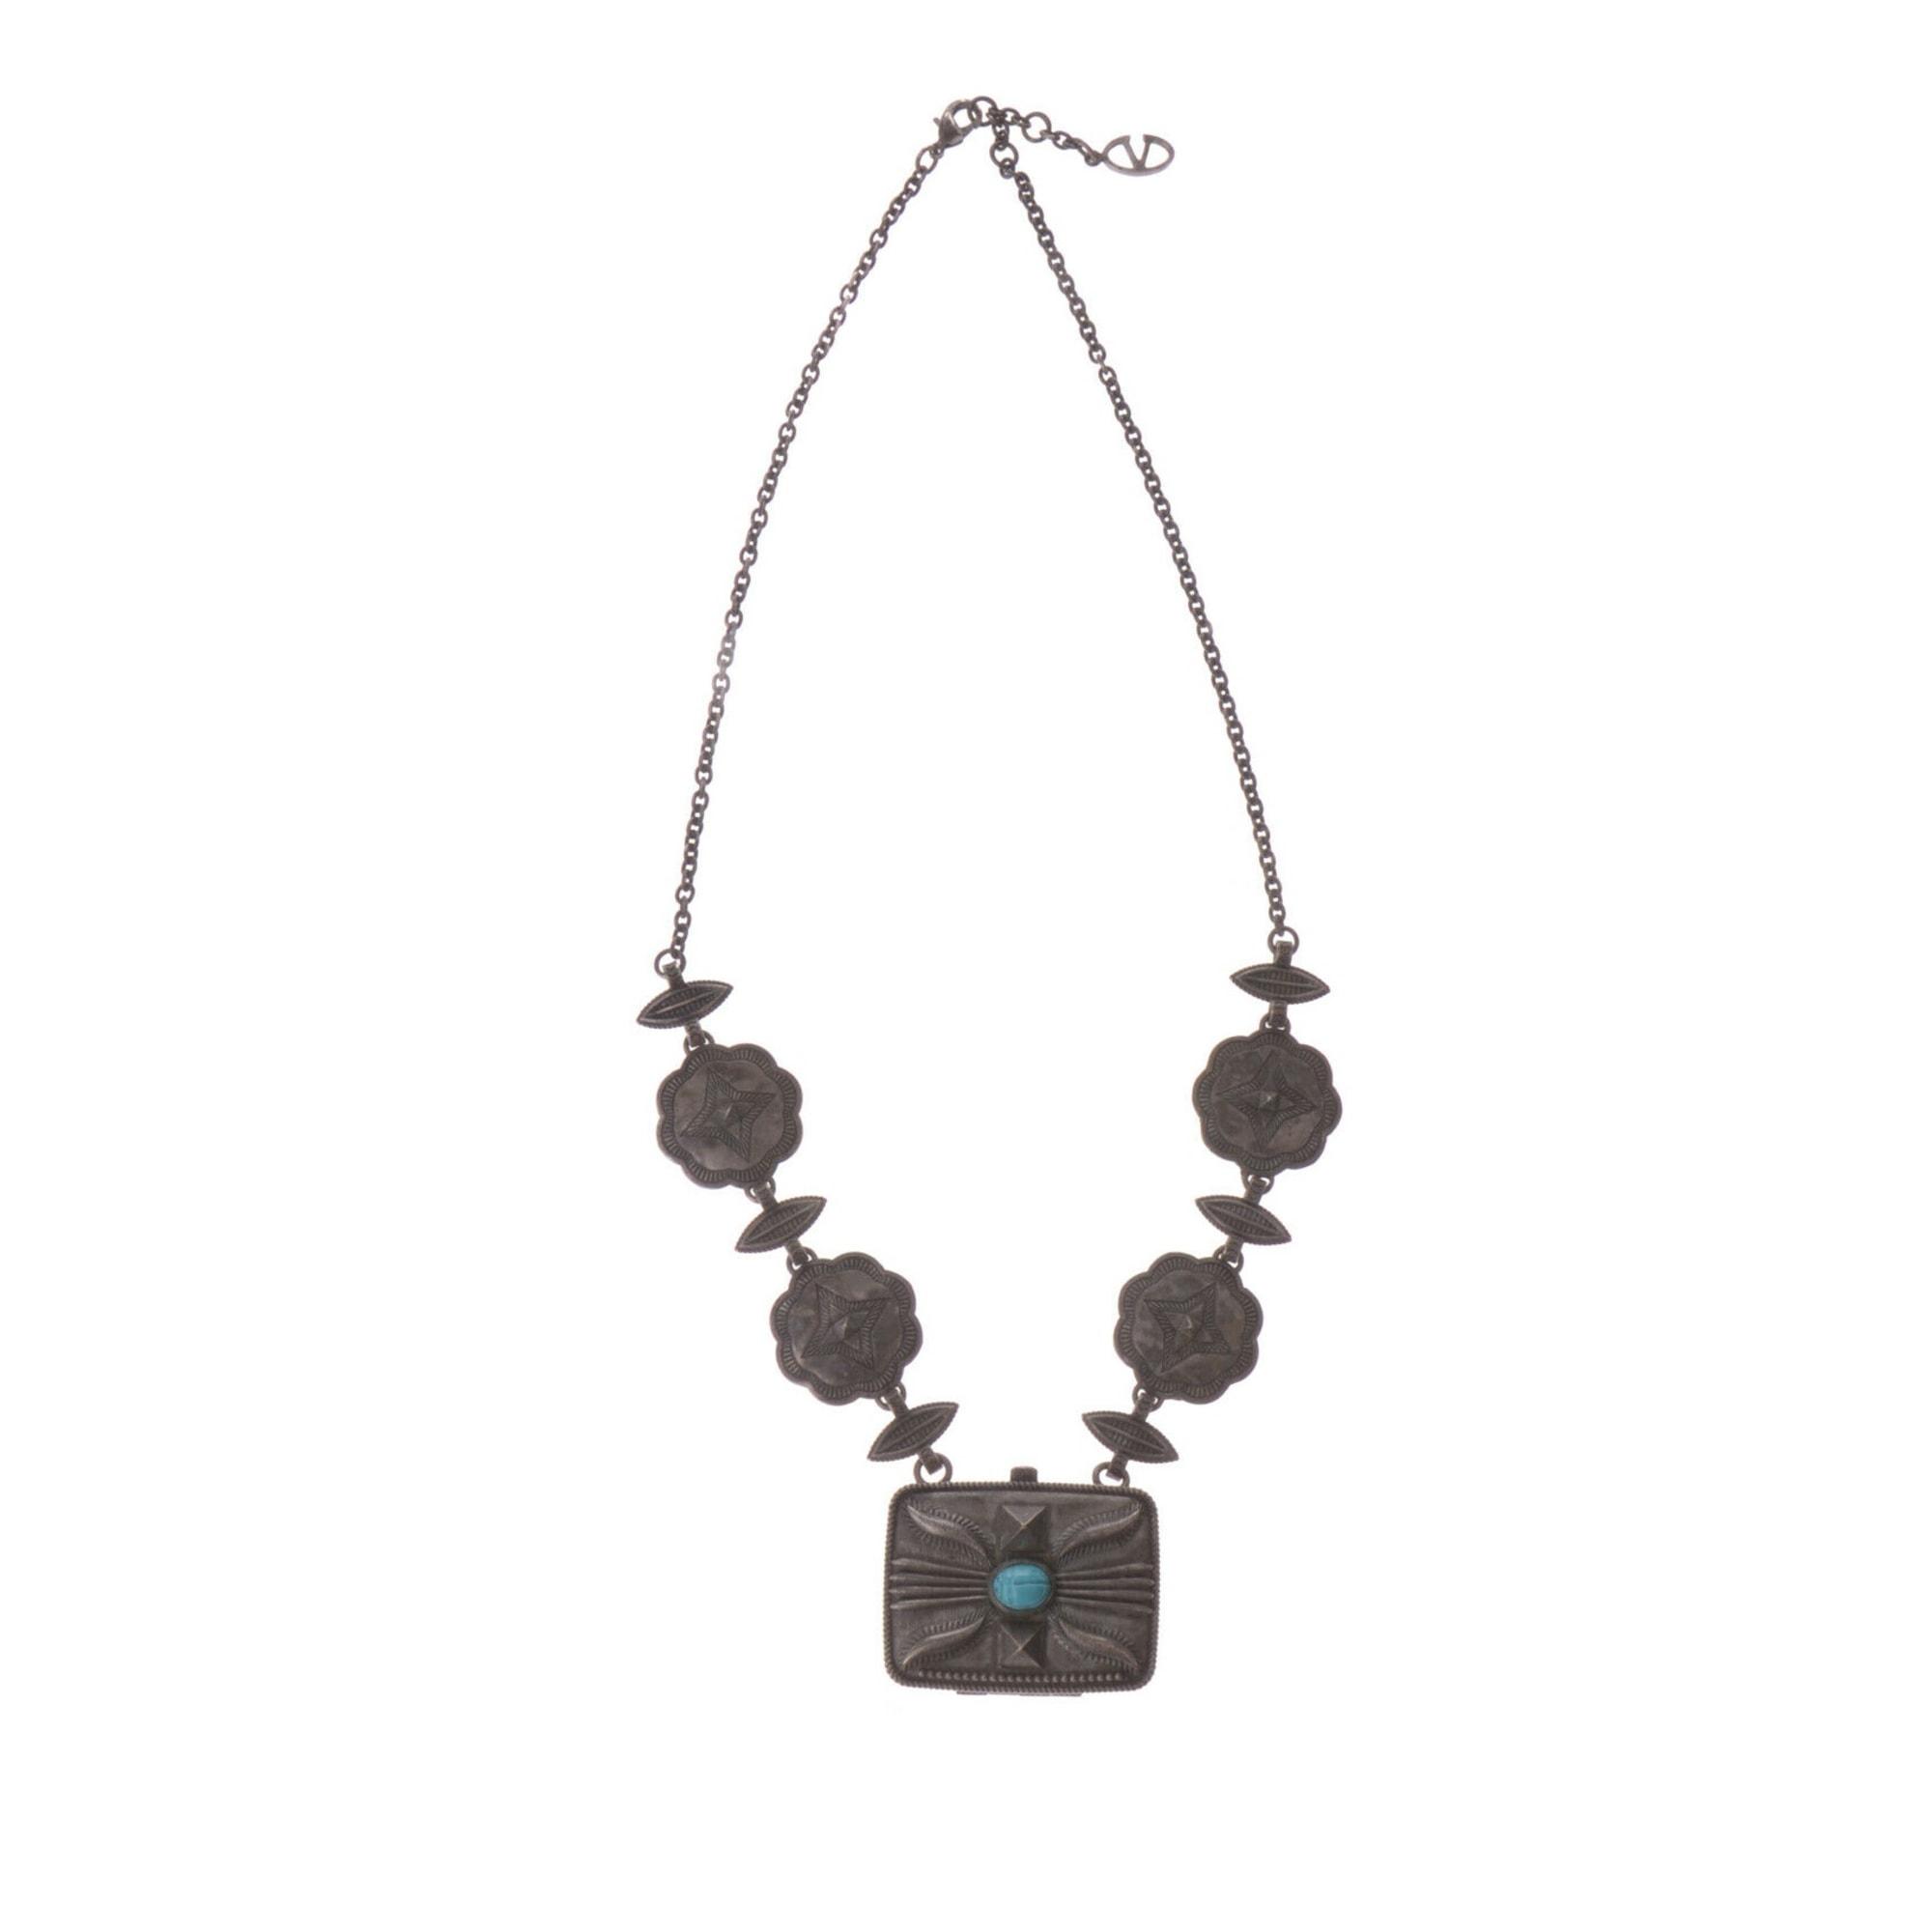 Pendentif, collier pendentif VALENTINO métal argent